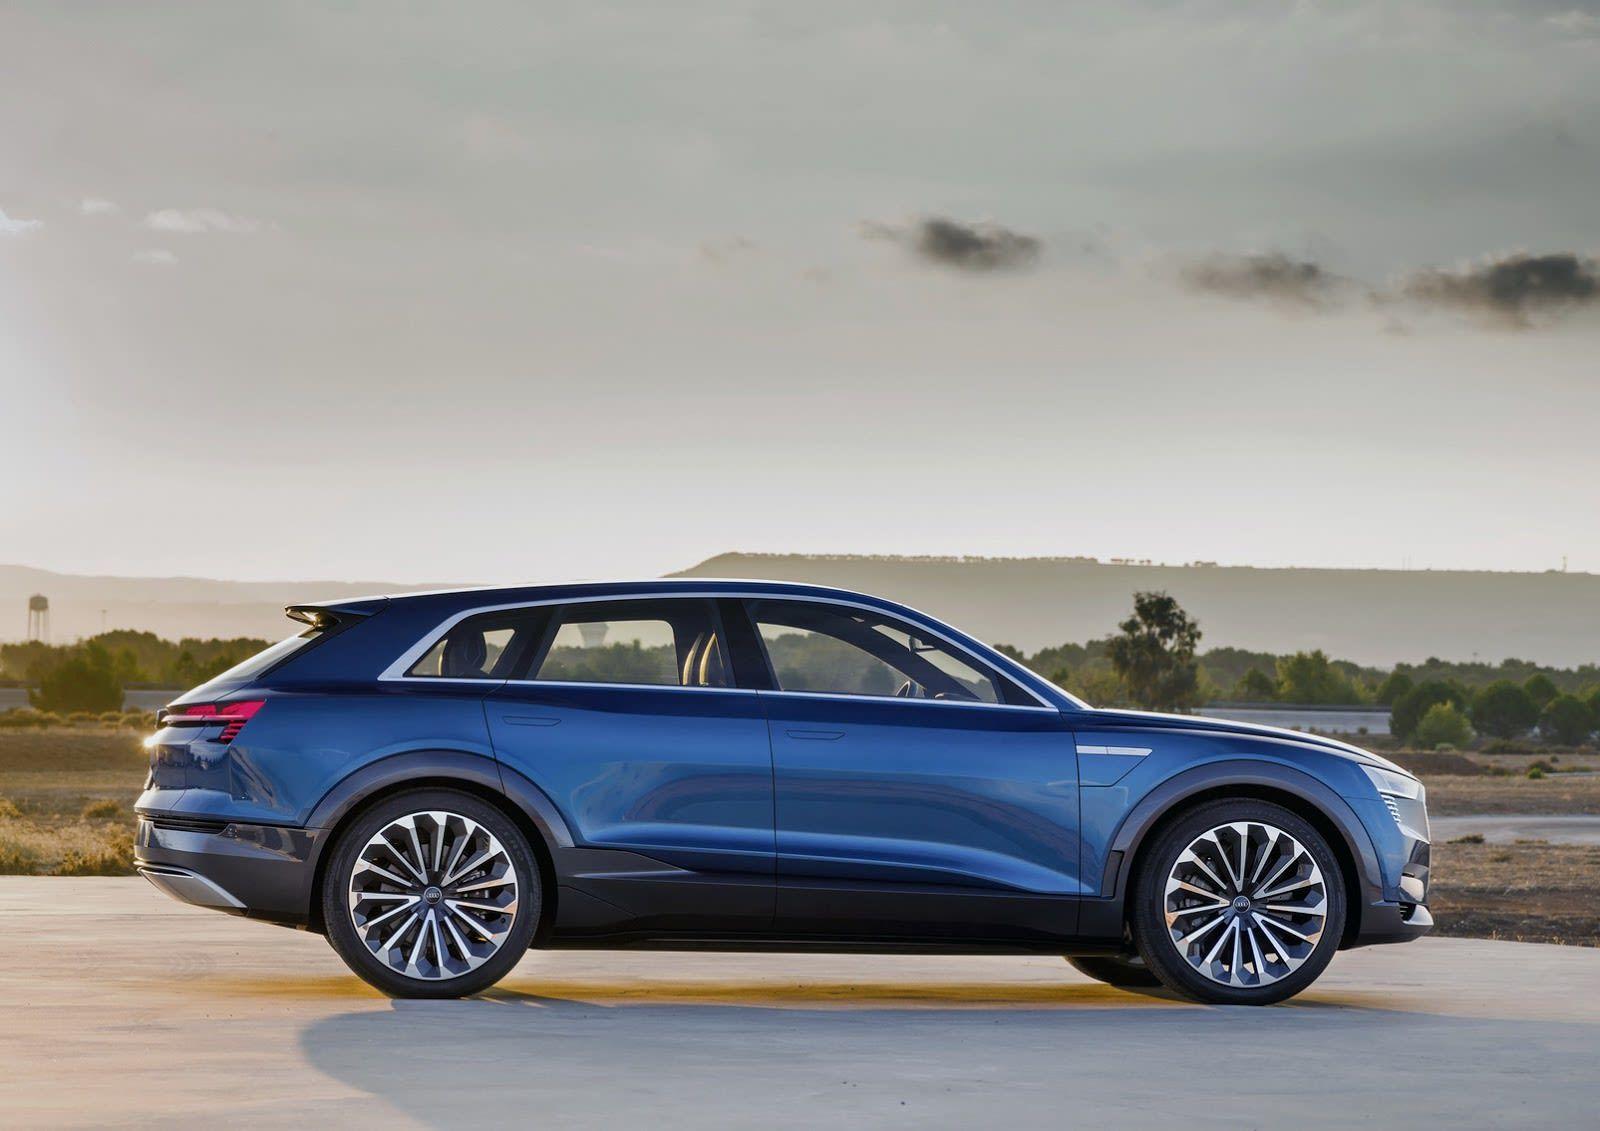 Audi S Car Interior Of The Future Has Screens Everywhere In 2020 Audi E Tron Audi Q4 E Tron